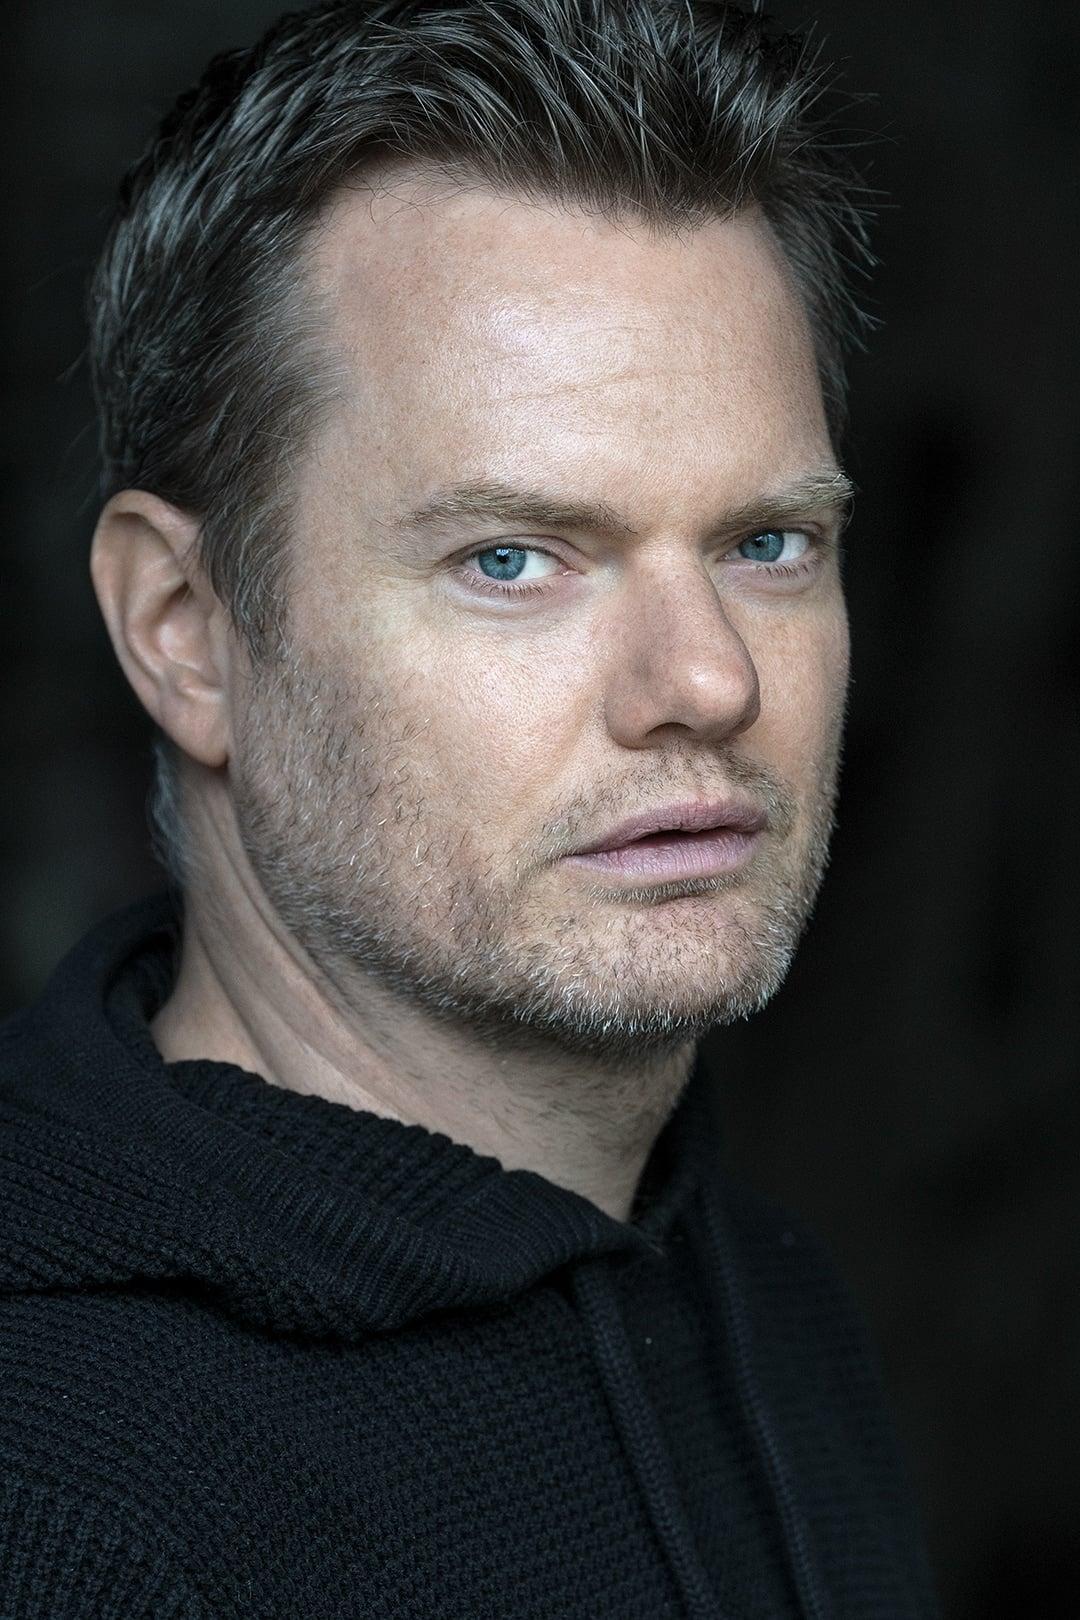 Thorsten Wettcke